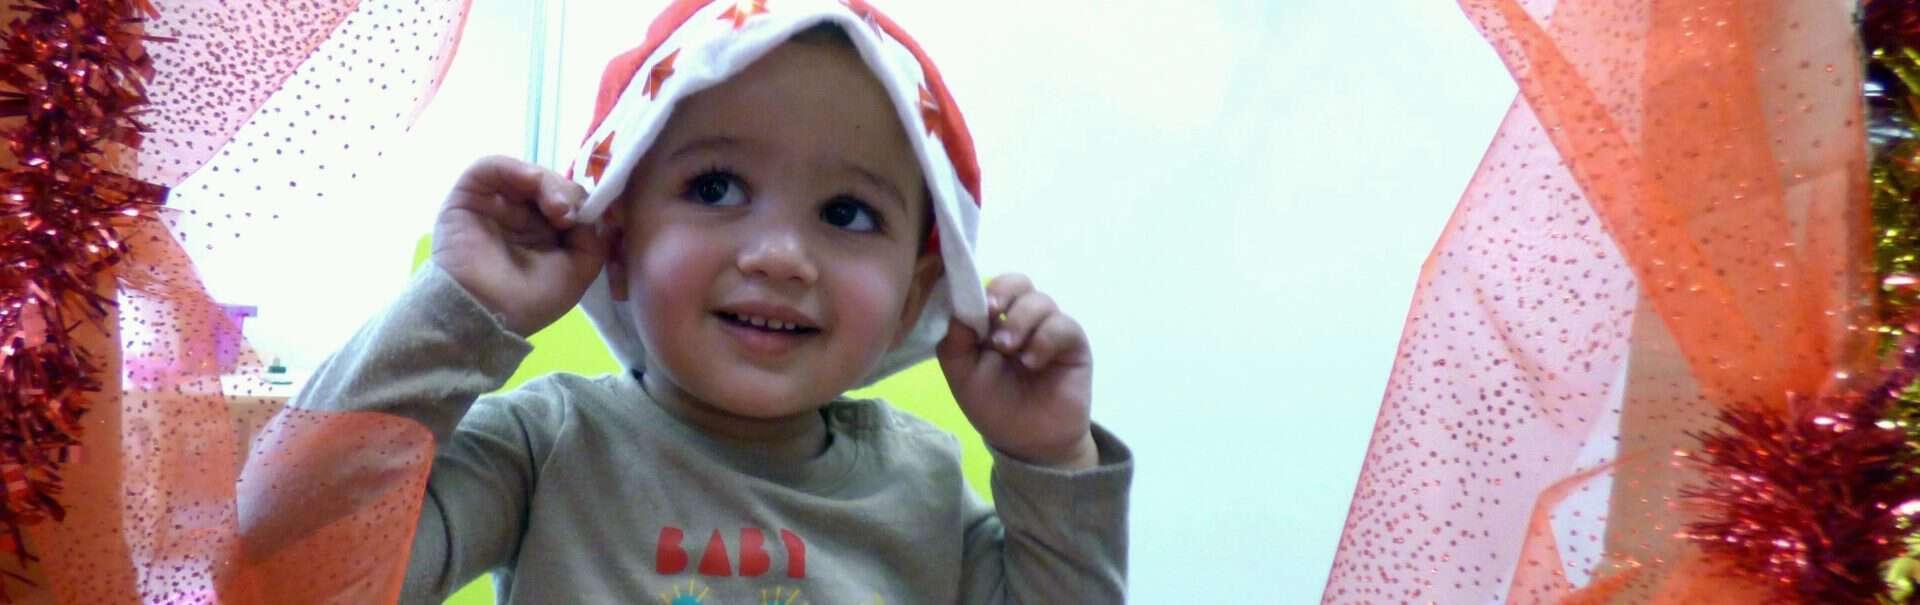 Petit garçon Habitat et Humanisme Noel